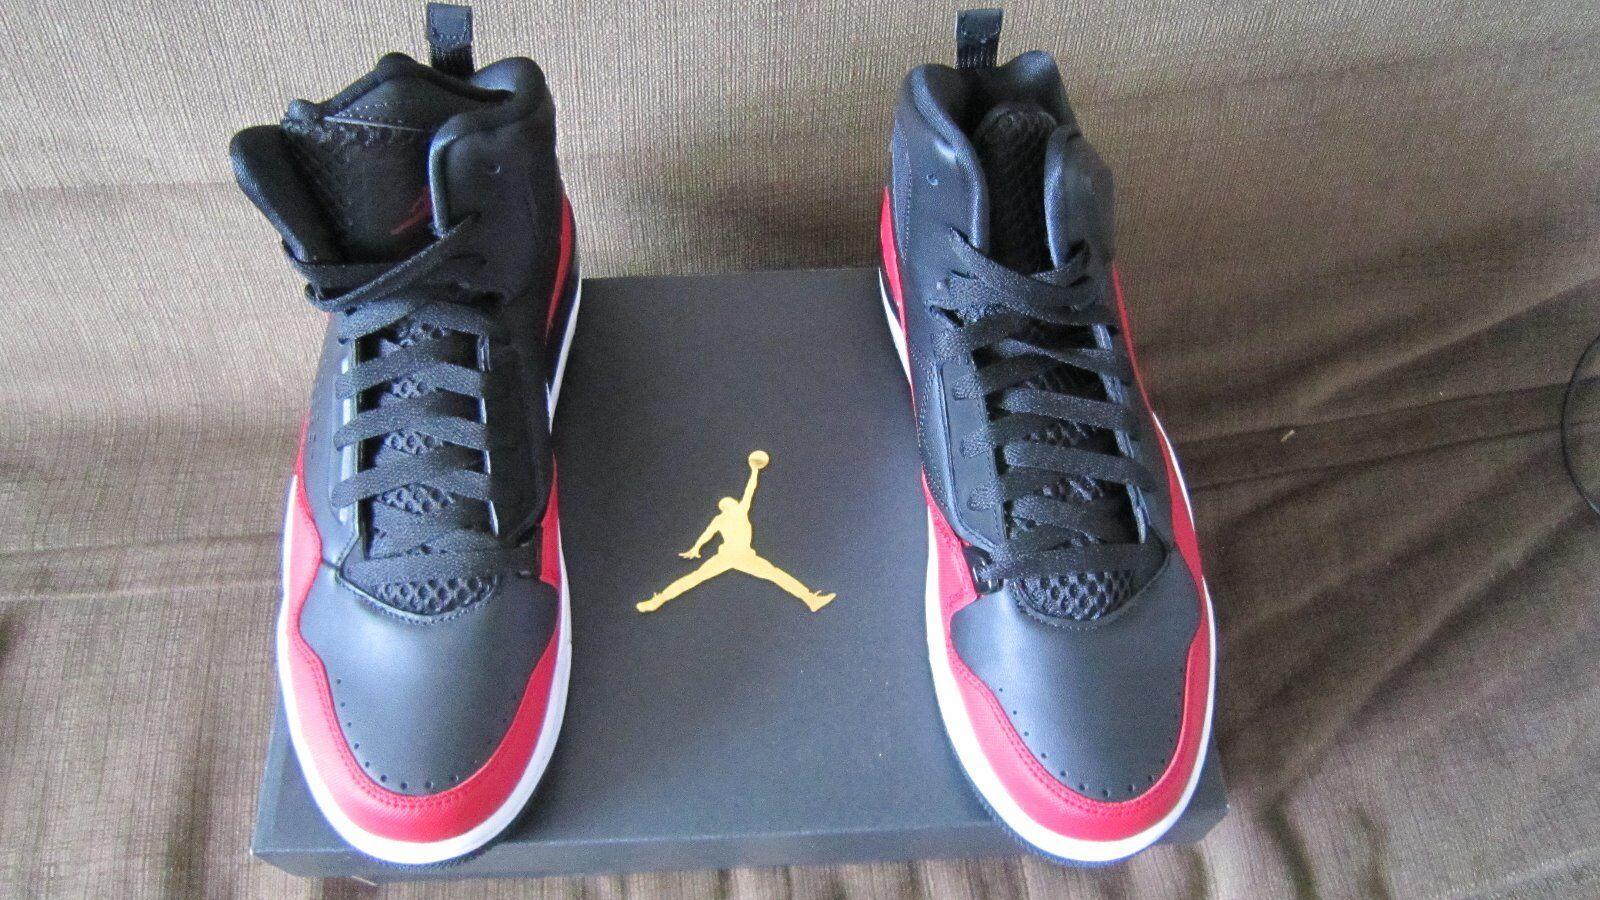 more photos 1e70b 02da6 Chaussures Chaussures Chaussures Basketball Homme Air Jordan, SC-3, Neuf,  Noire   Rouge, Taille 42 9894d7